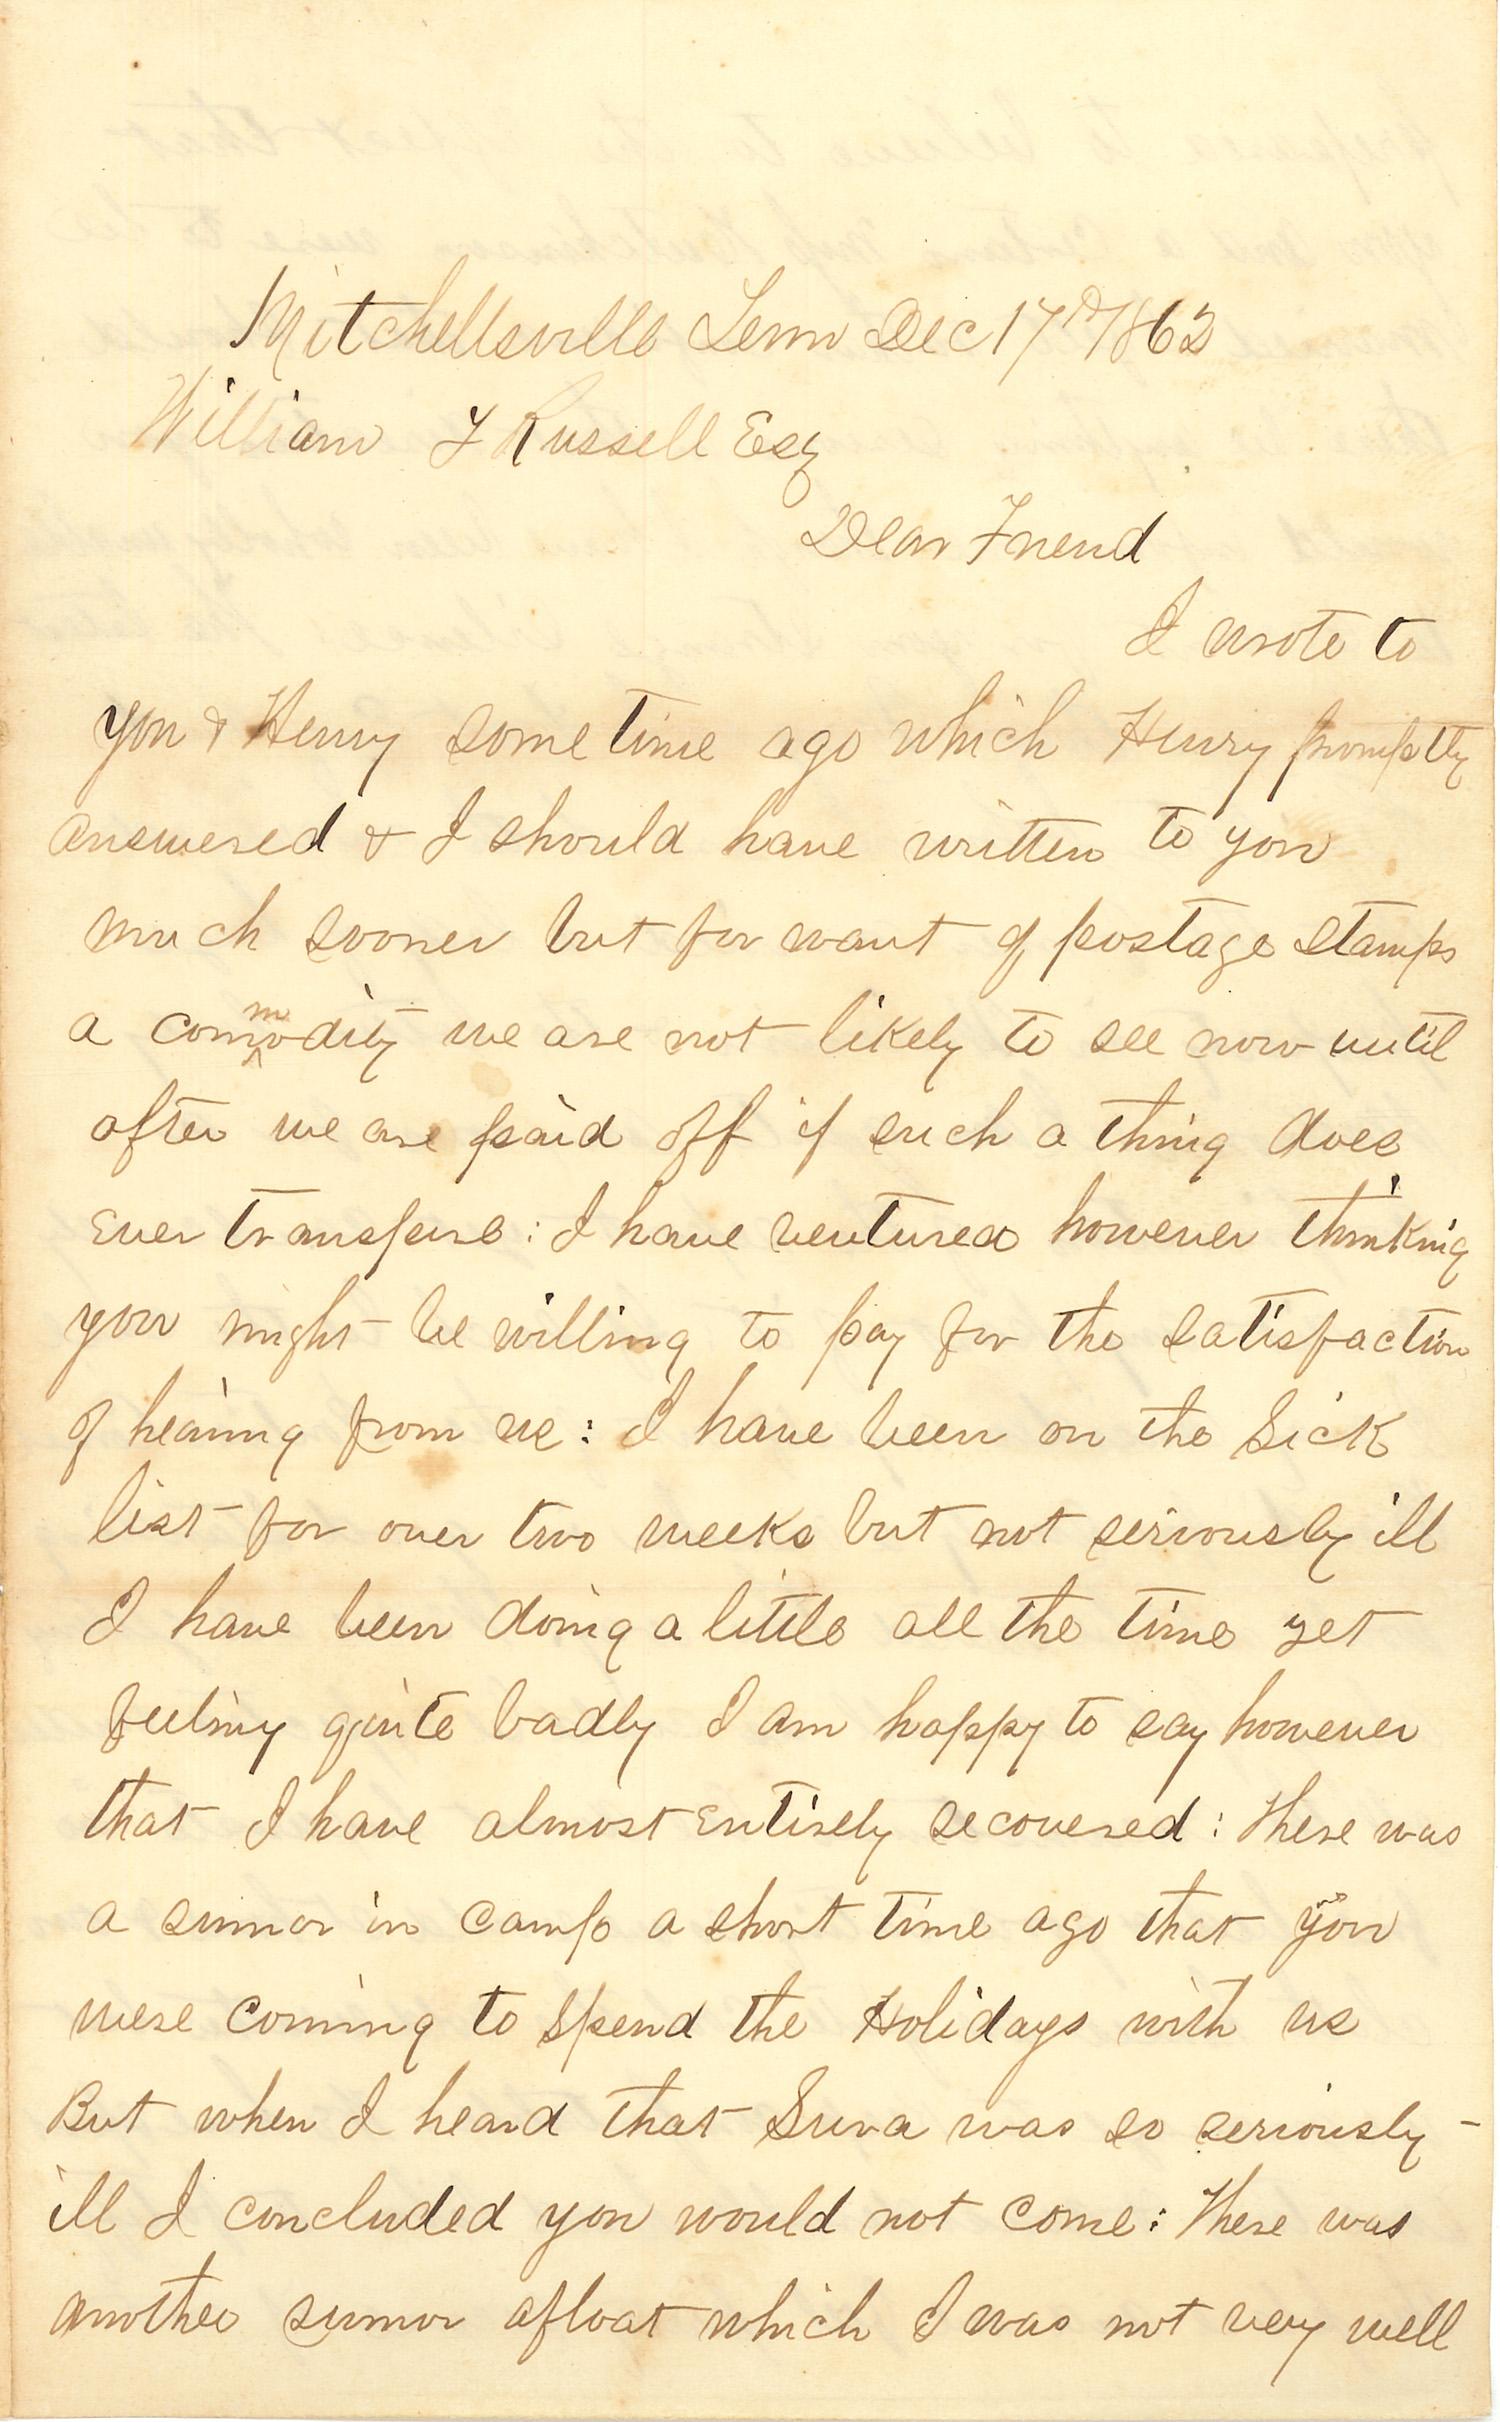 Joseph Culver Letter, December 17, 1862, Page 1